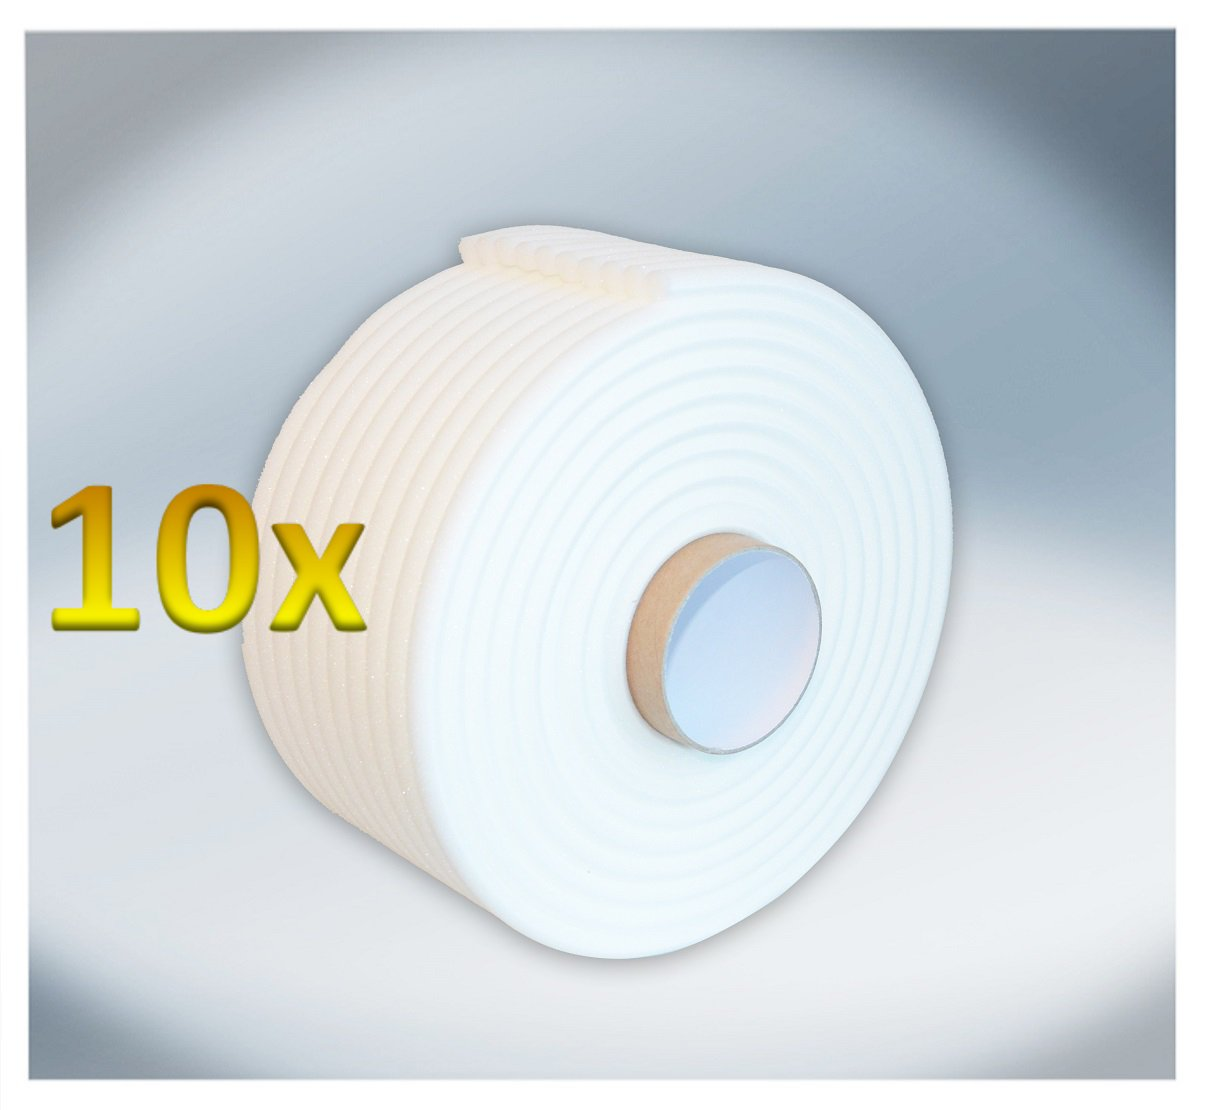 Softtape Foamtape 13mm x 50m fü r Autolack Lackierer Schaumdichtband (5 stucke) (301-5) BenBow